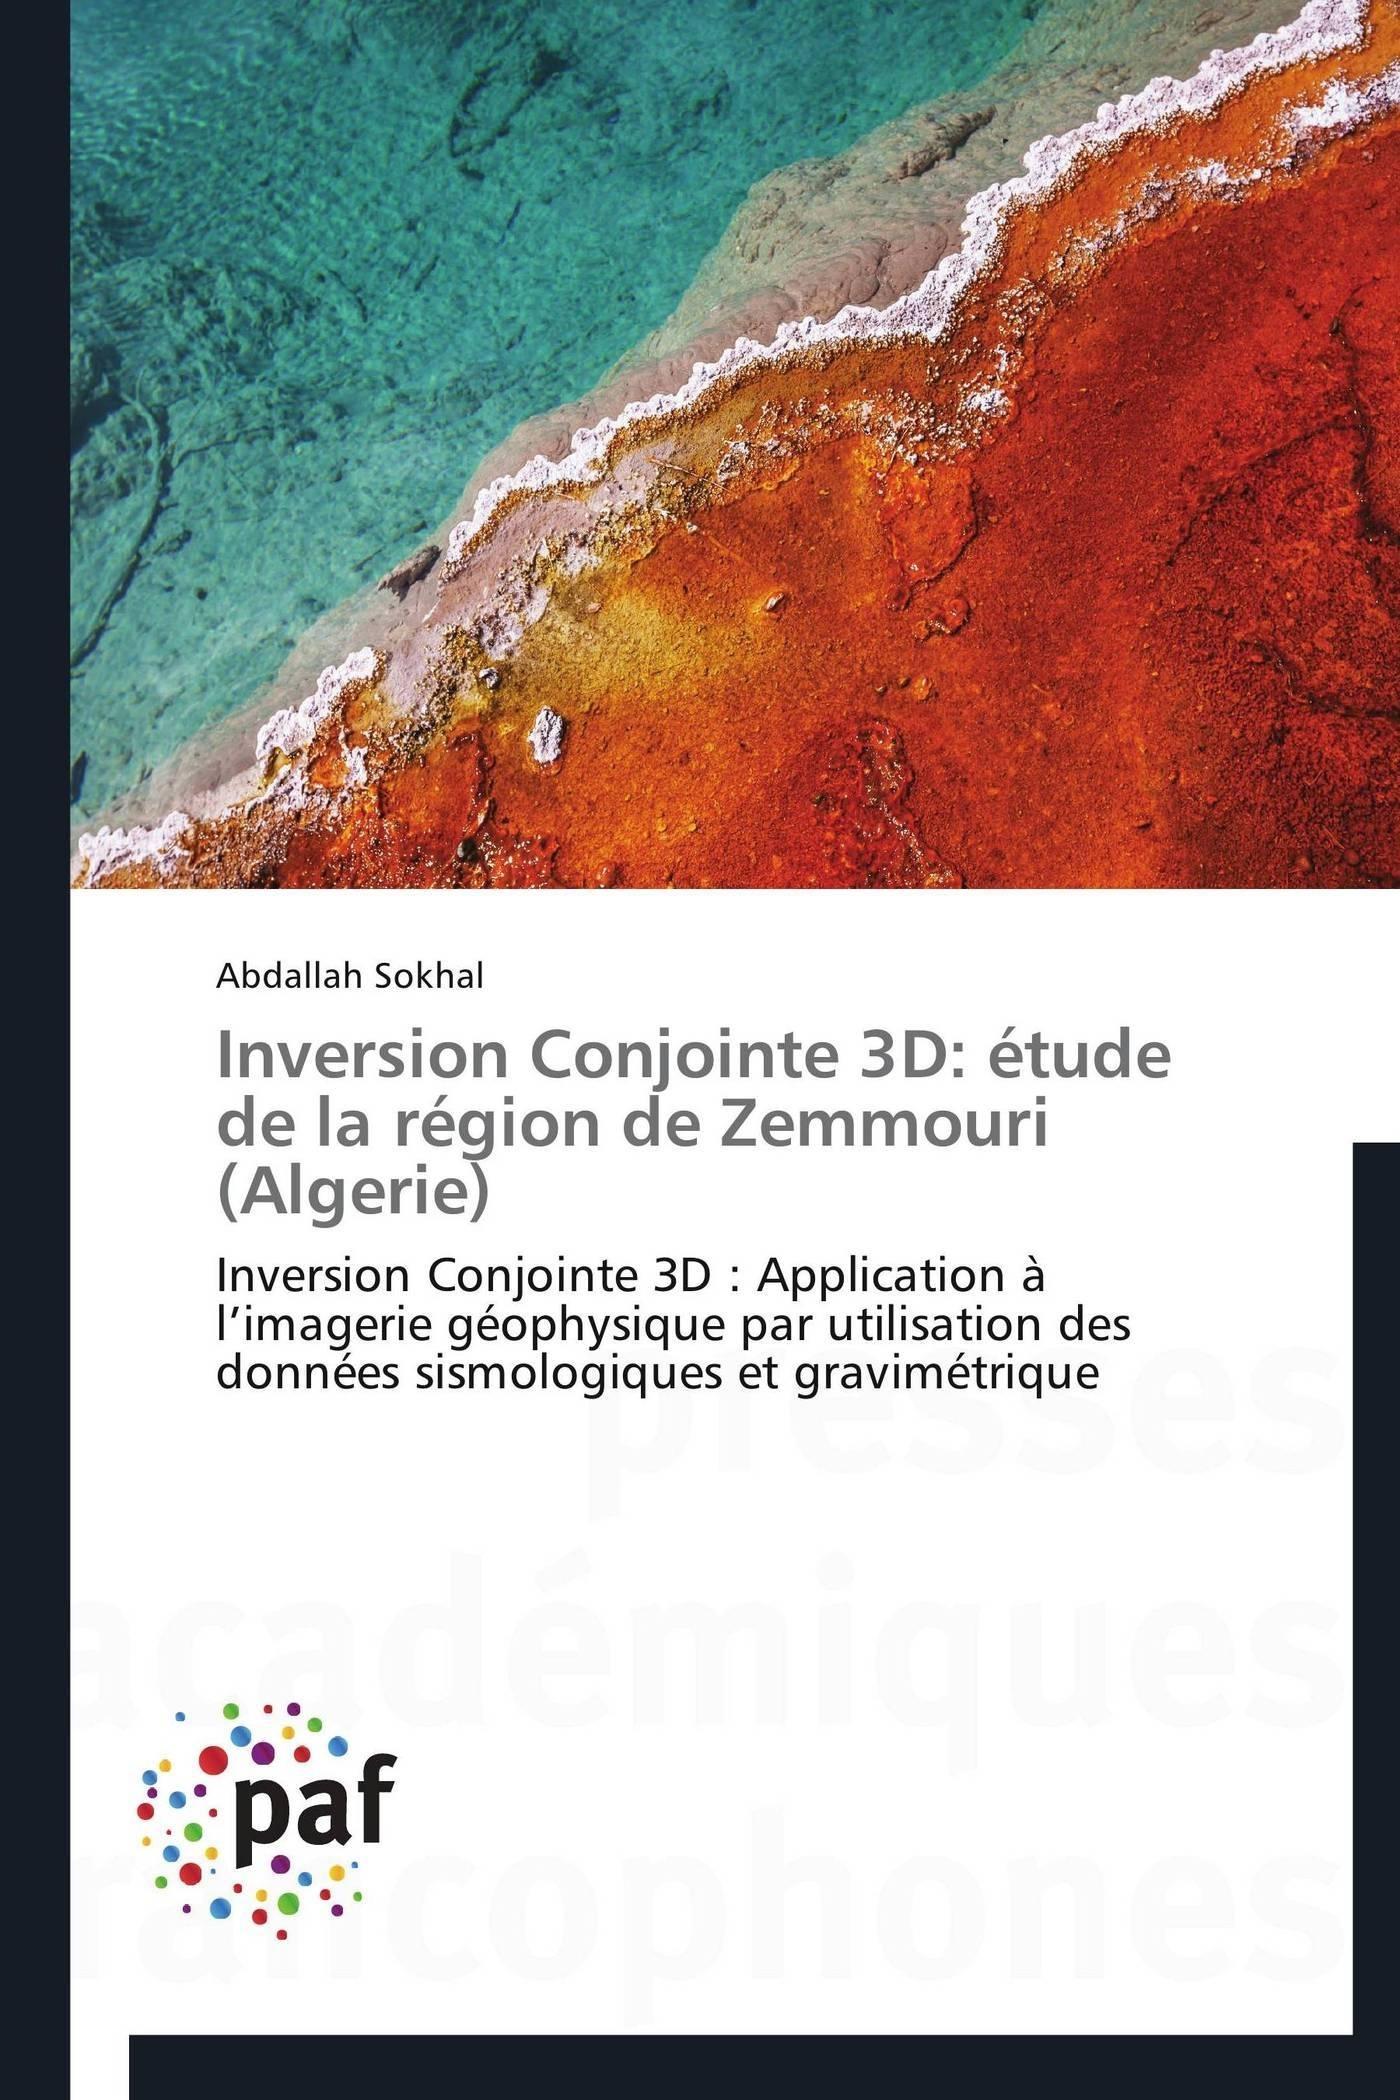 INVERSION CONJOINTE 3D: ETUDE DE LA REGION DE ZEMMOURI (ALGERIE)